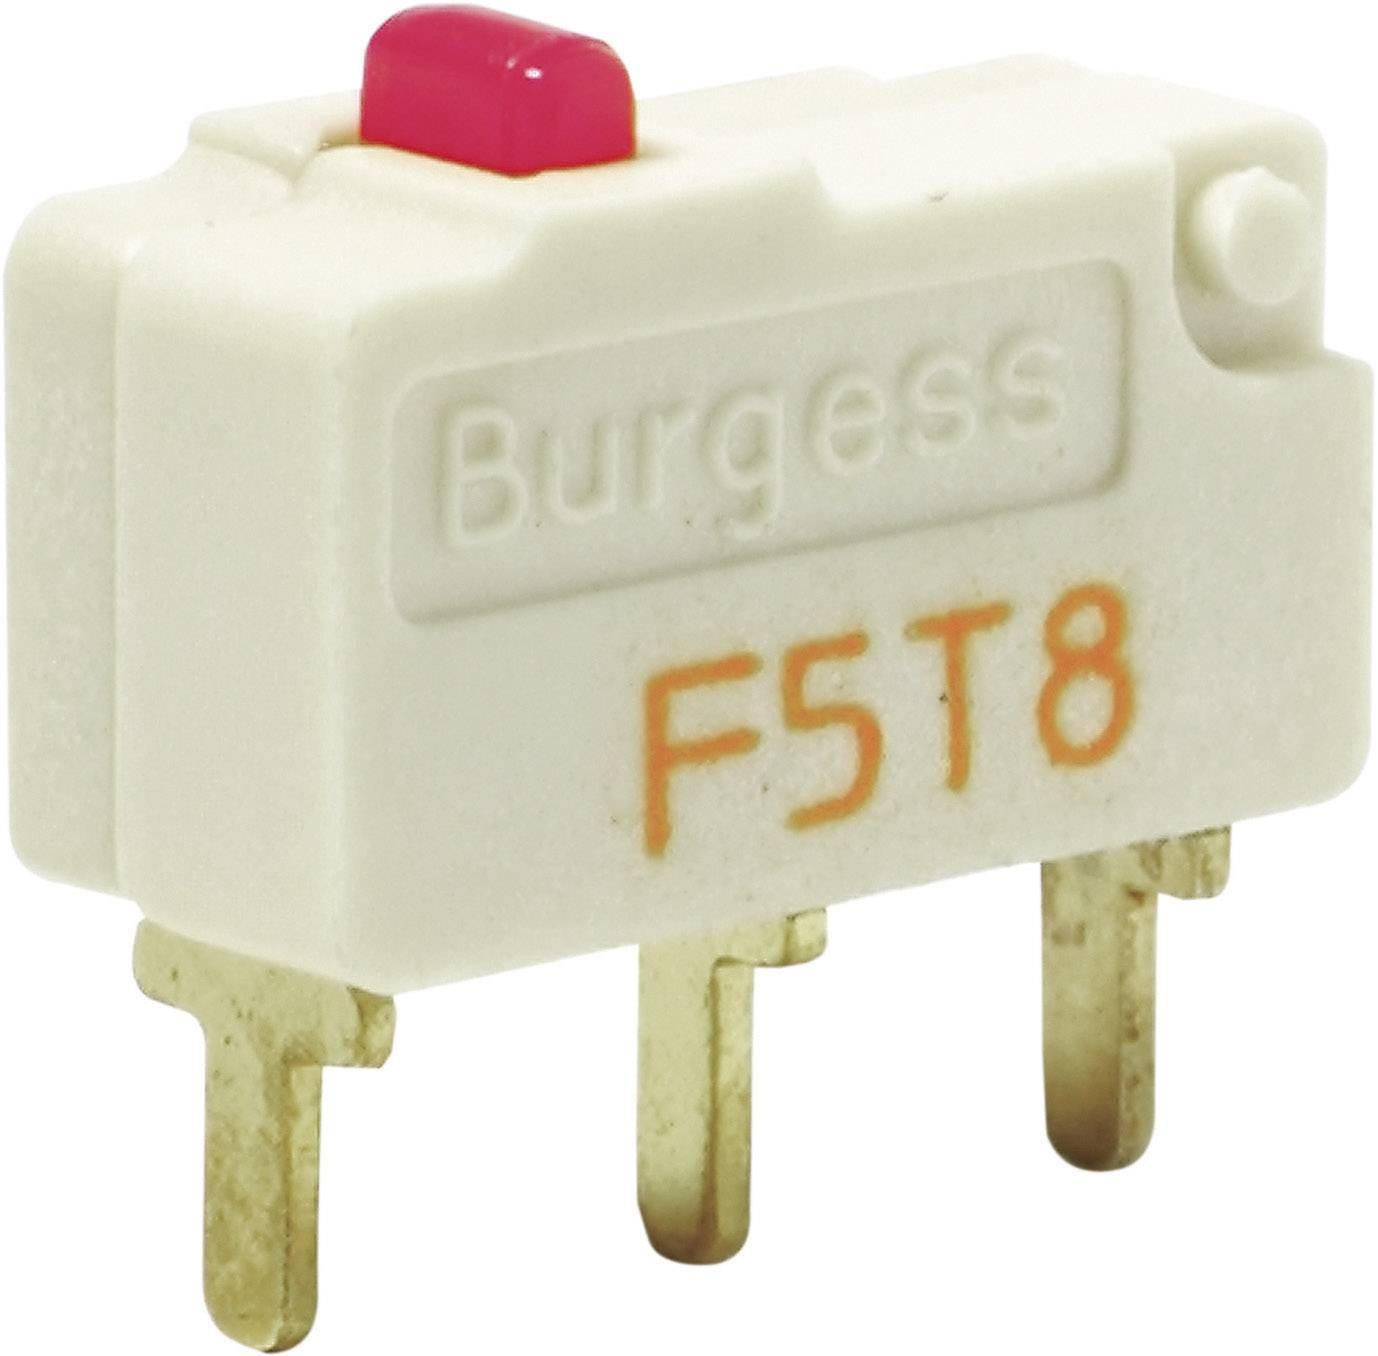 Mikrospínač Burgess série F5 - páčka